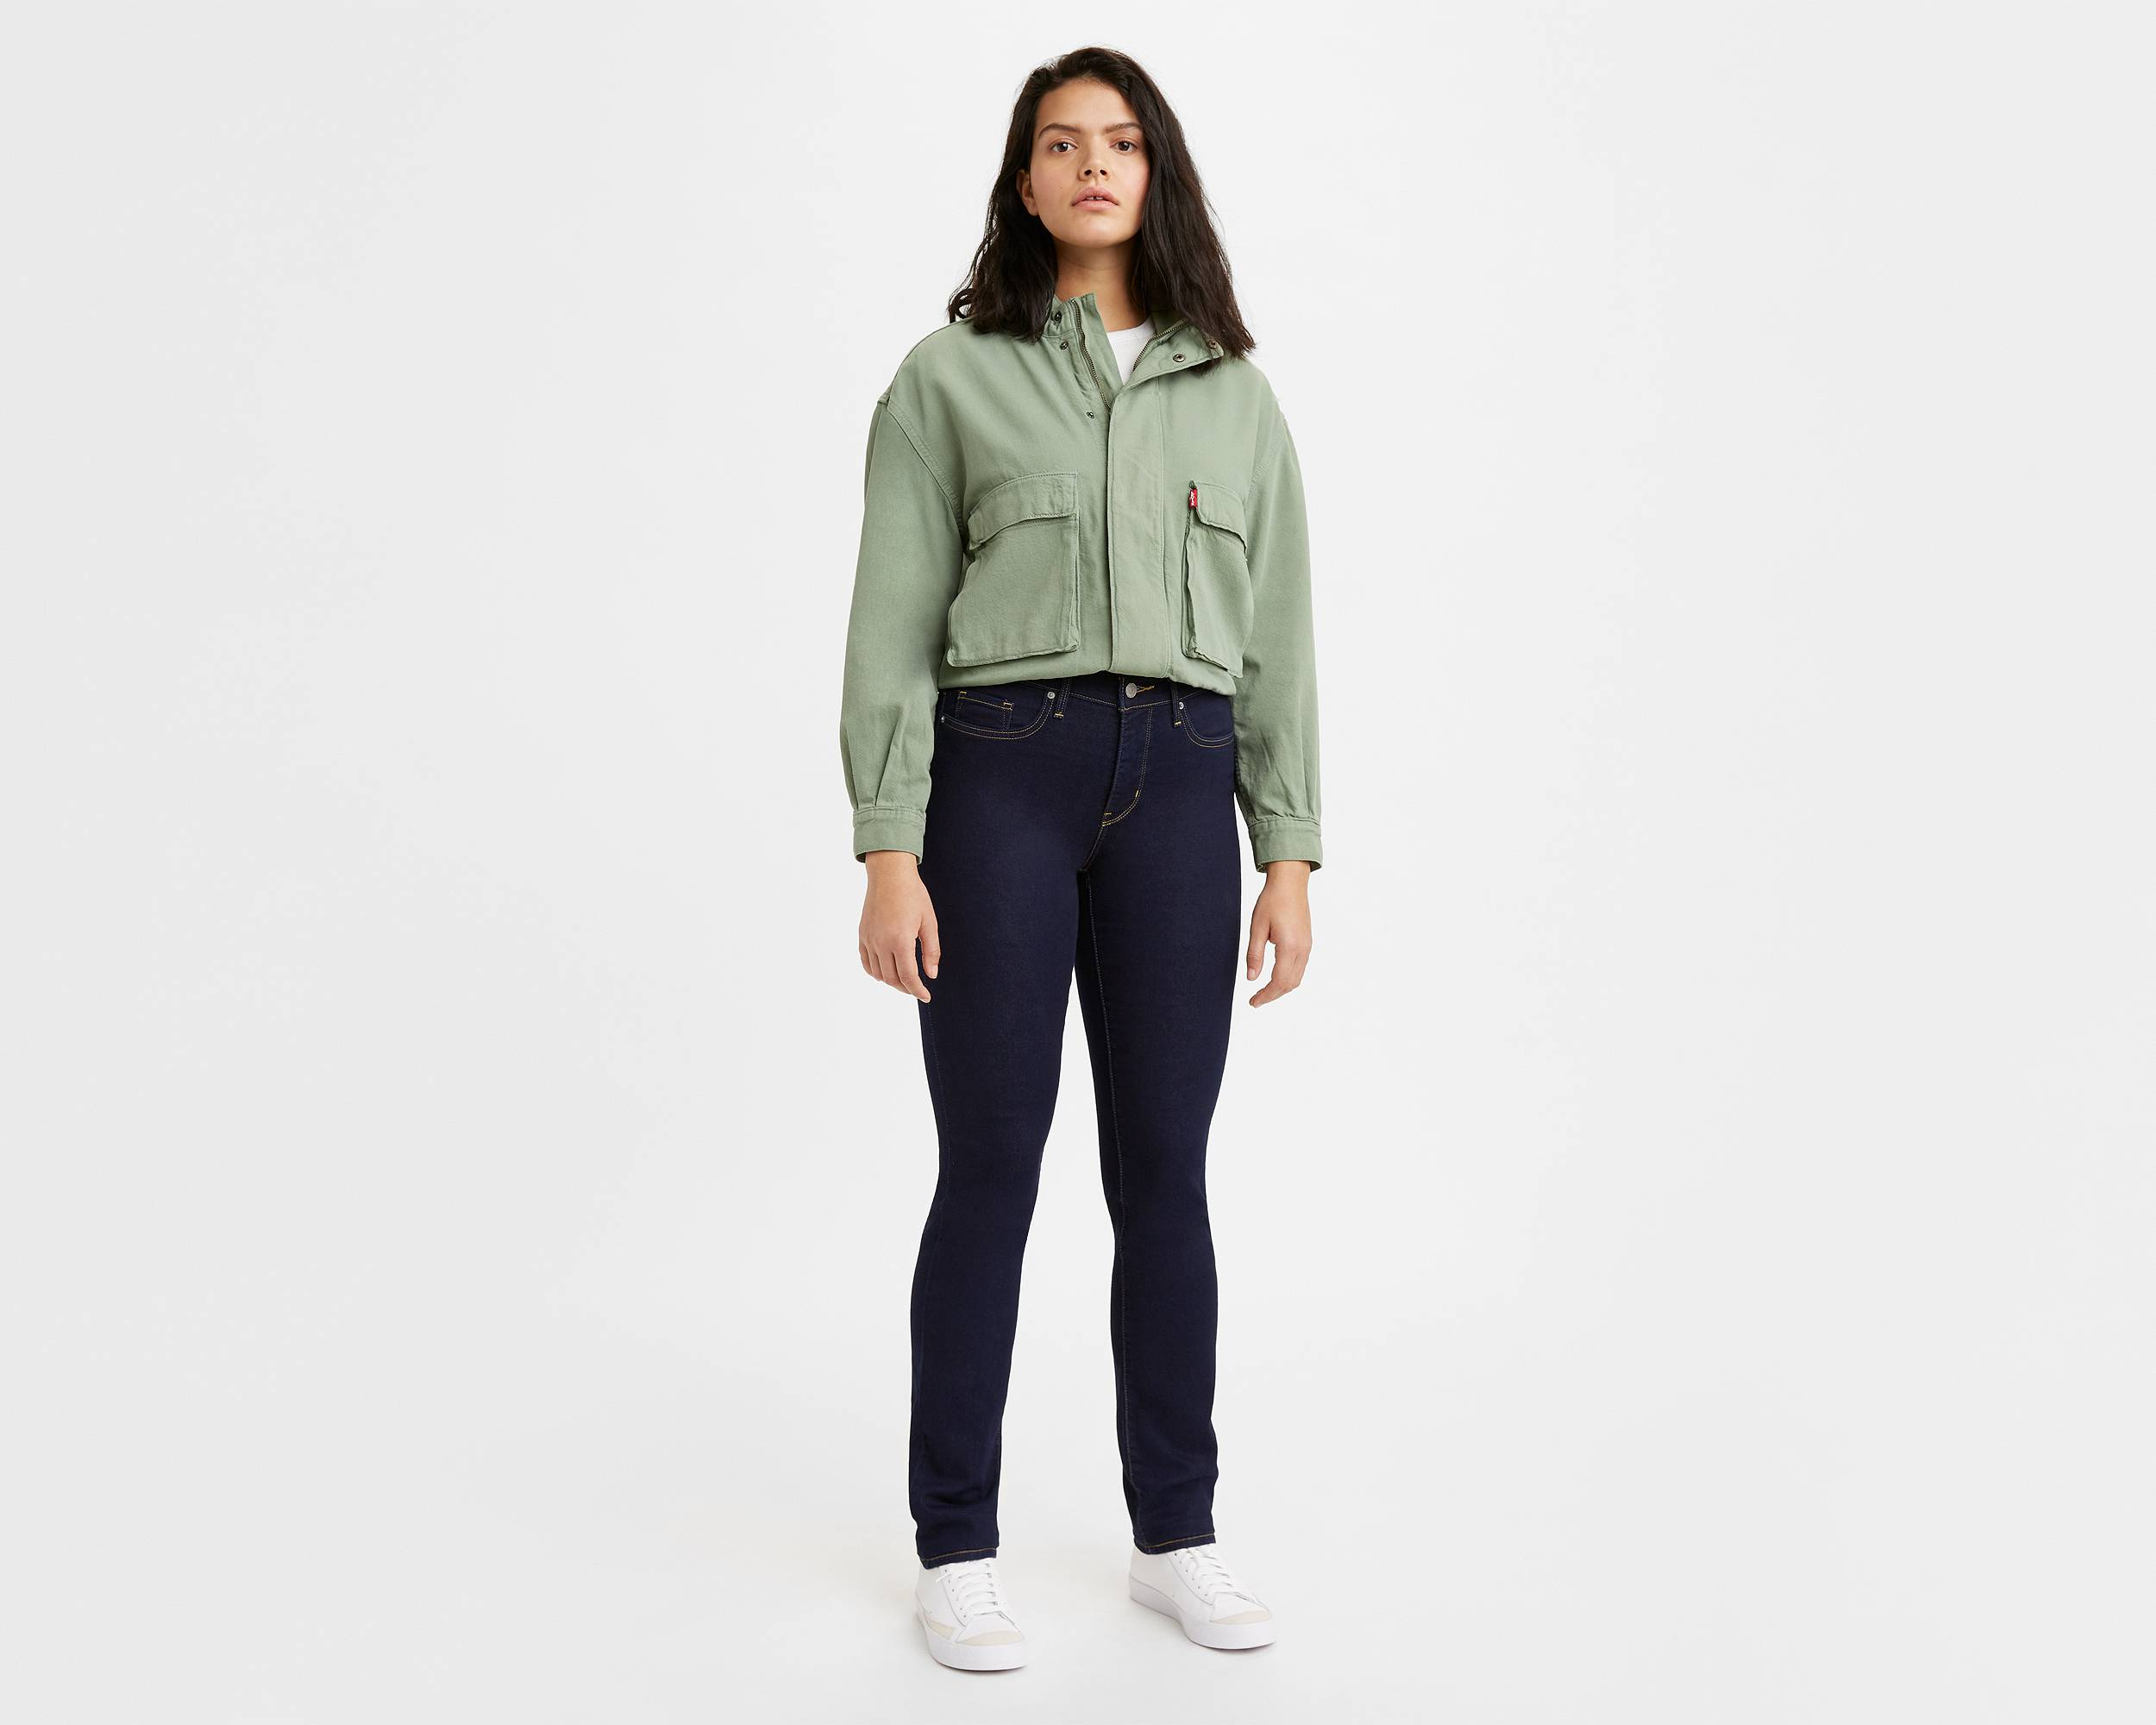 312 Shaping Slim Jeans   Darkest Sky  Levi's® United States (US)